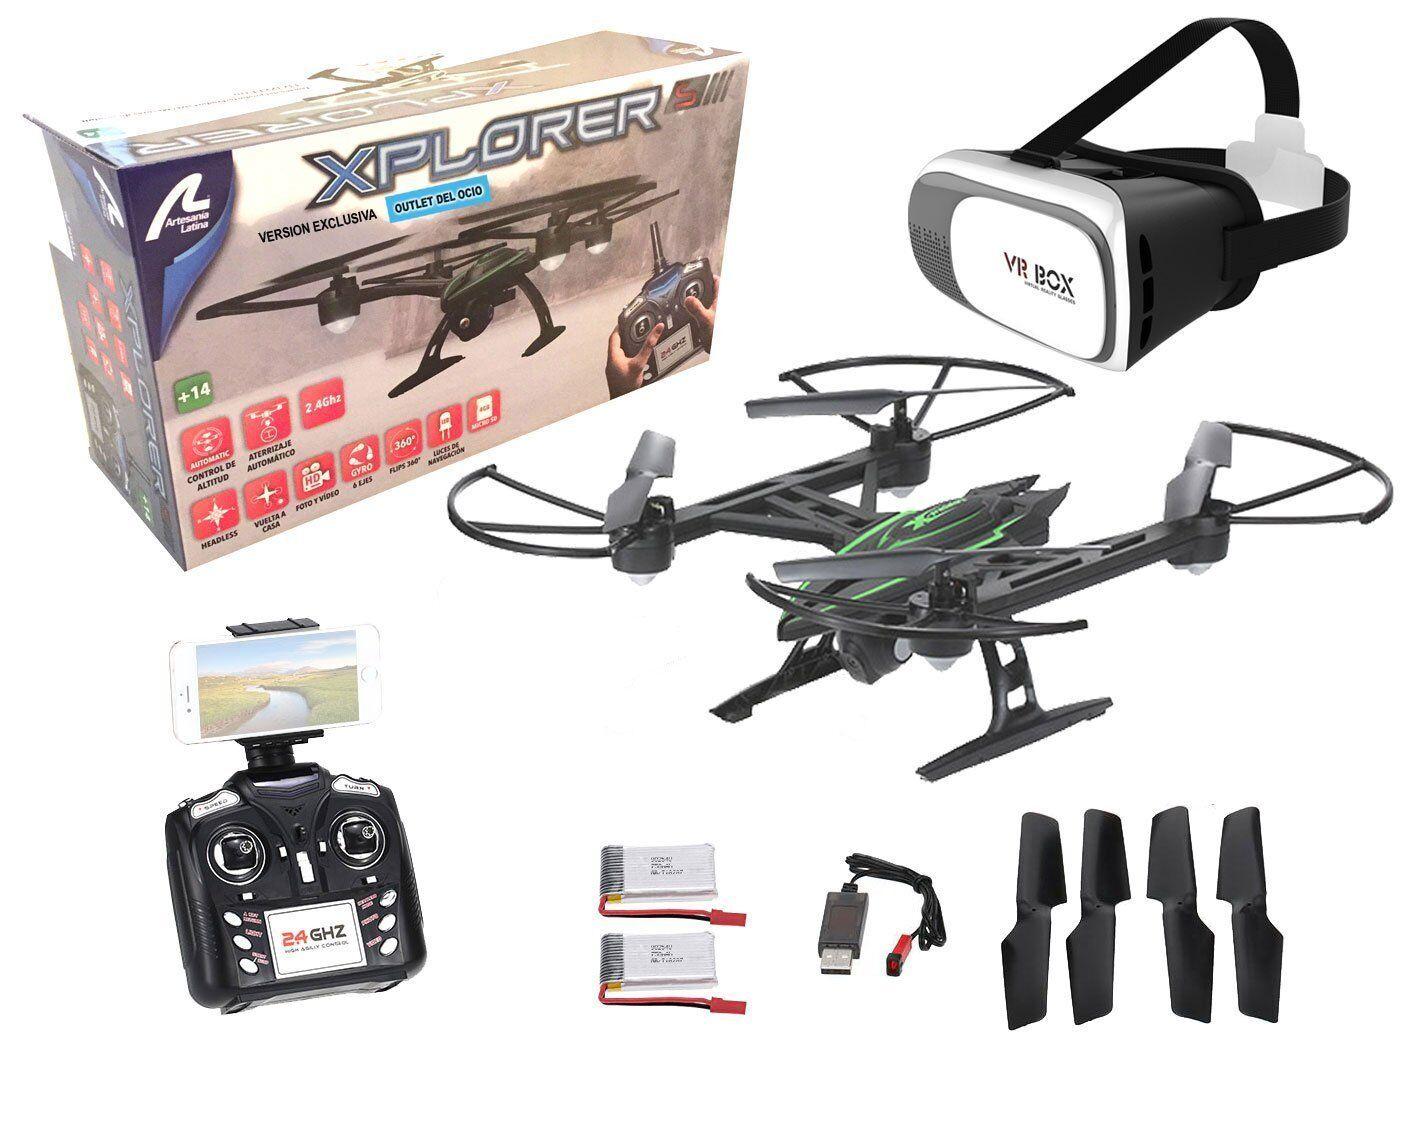 Drone radio control with camera Xplorer Wifi FPV+Glasses VR. Piloting real 2 bat